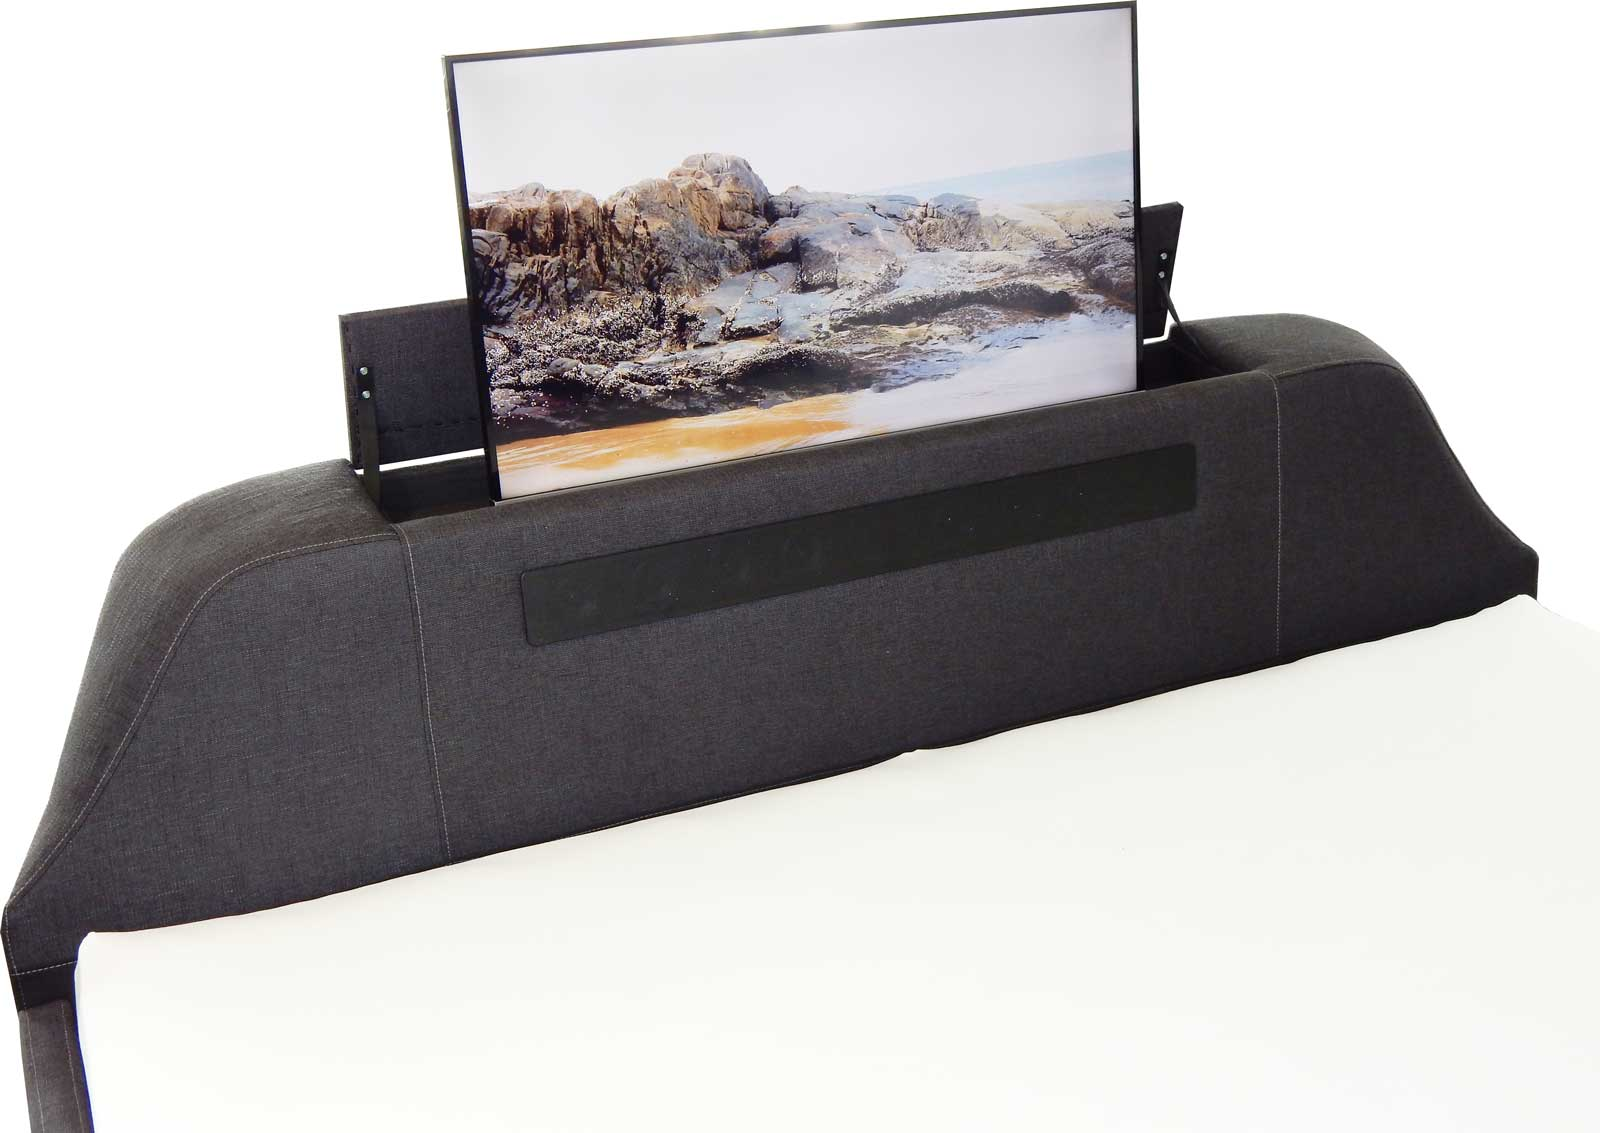 Tv Lifter Wasserbetten mit Soundbar